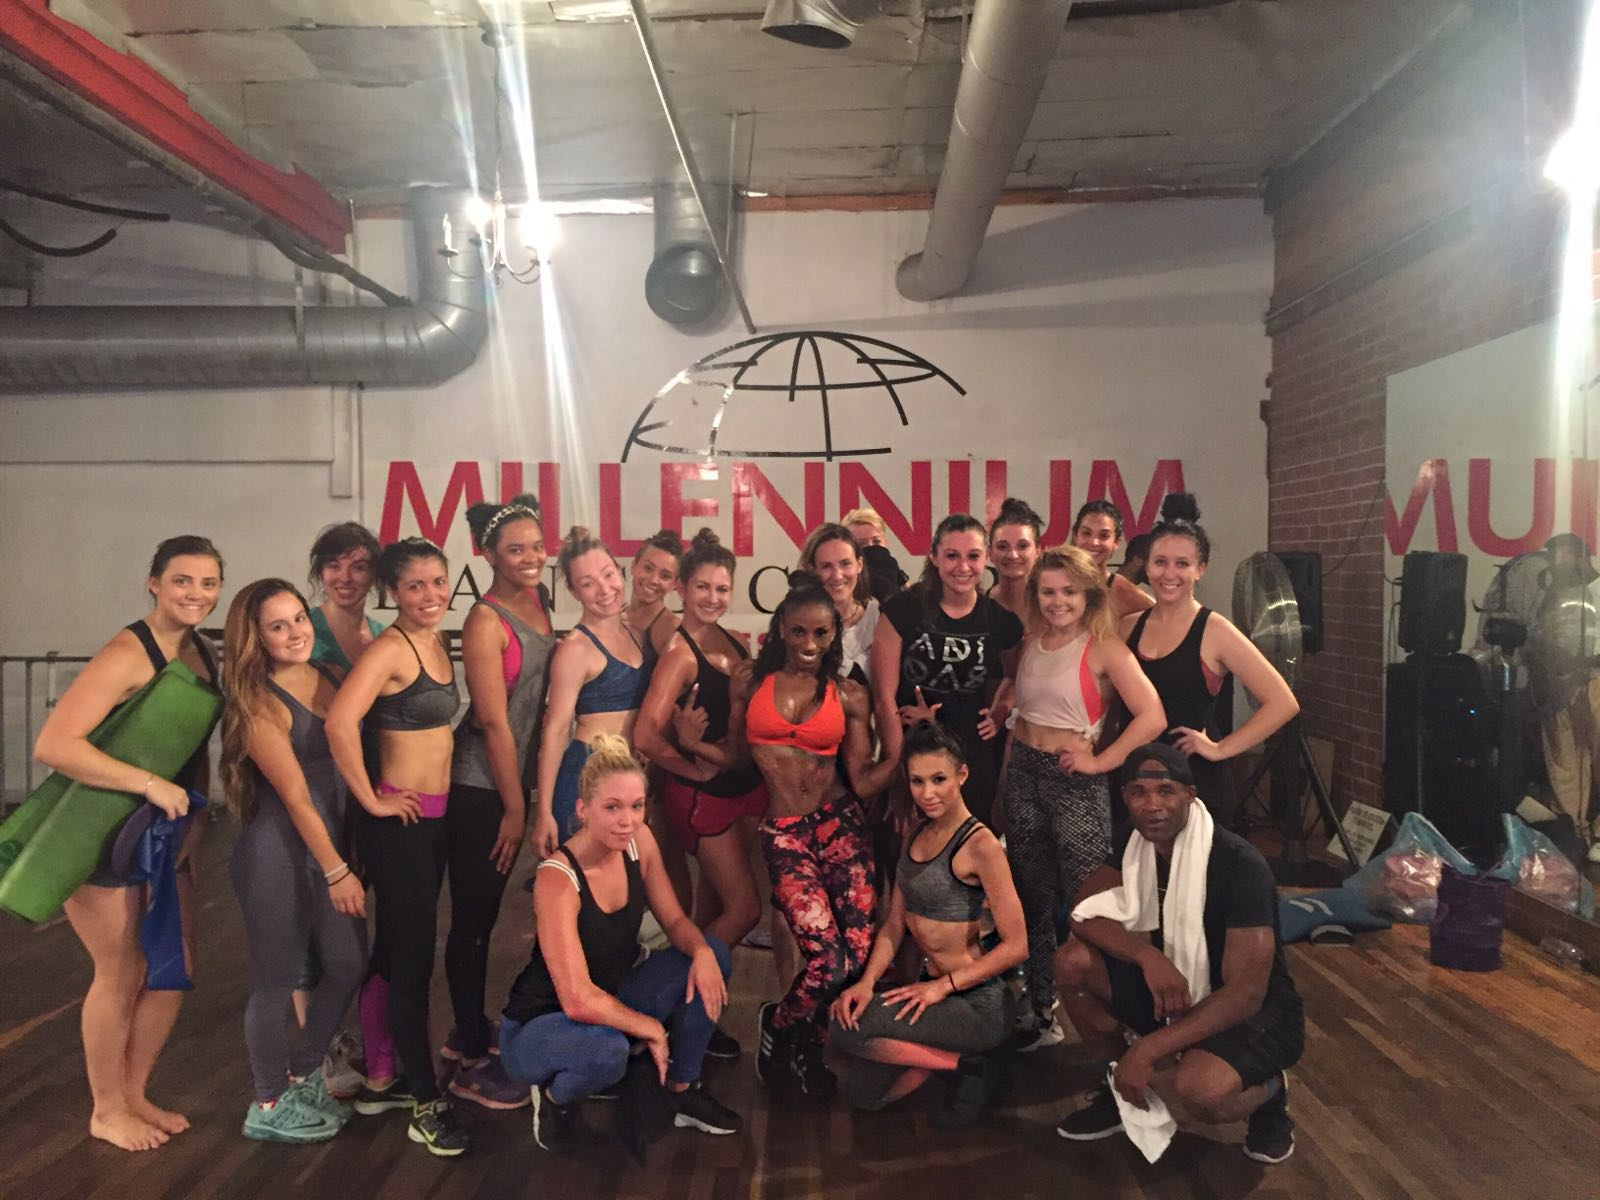 Millennium Dance Complex Fitness